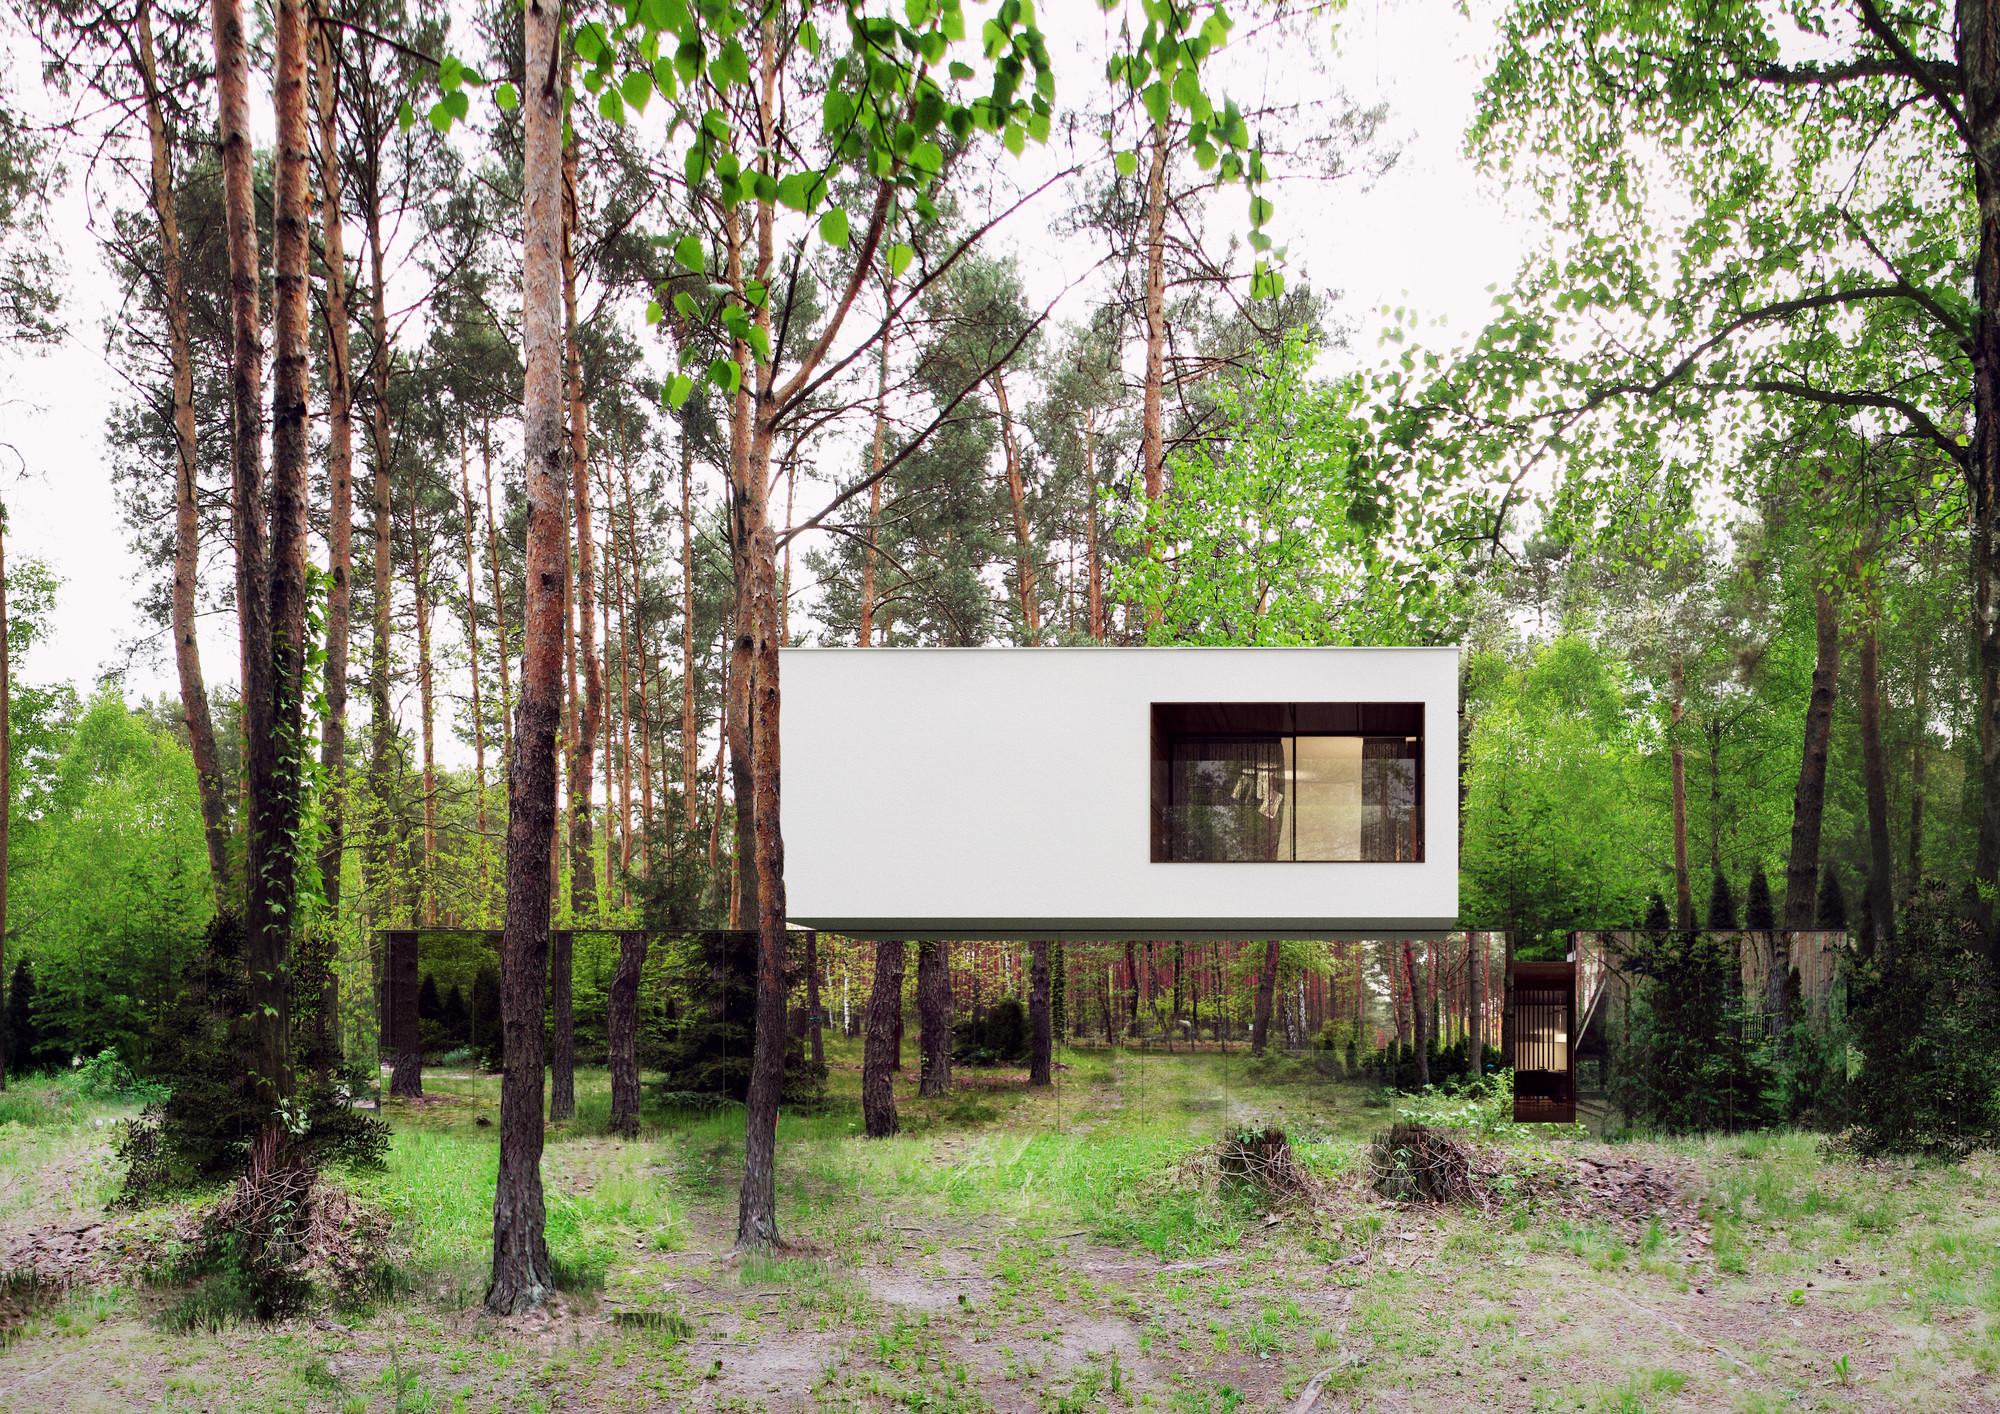 Izabelin House / REFORM Architekt, © Marcin Tomaszewski